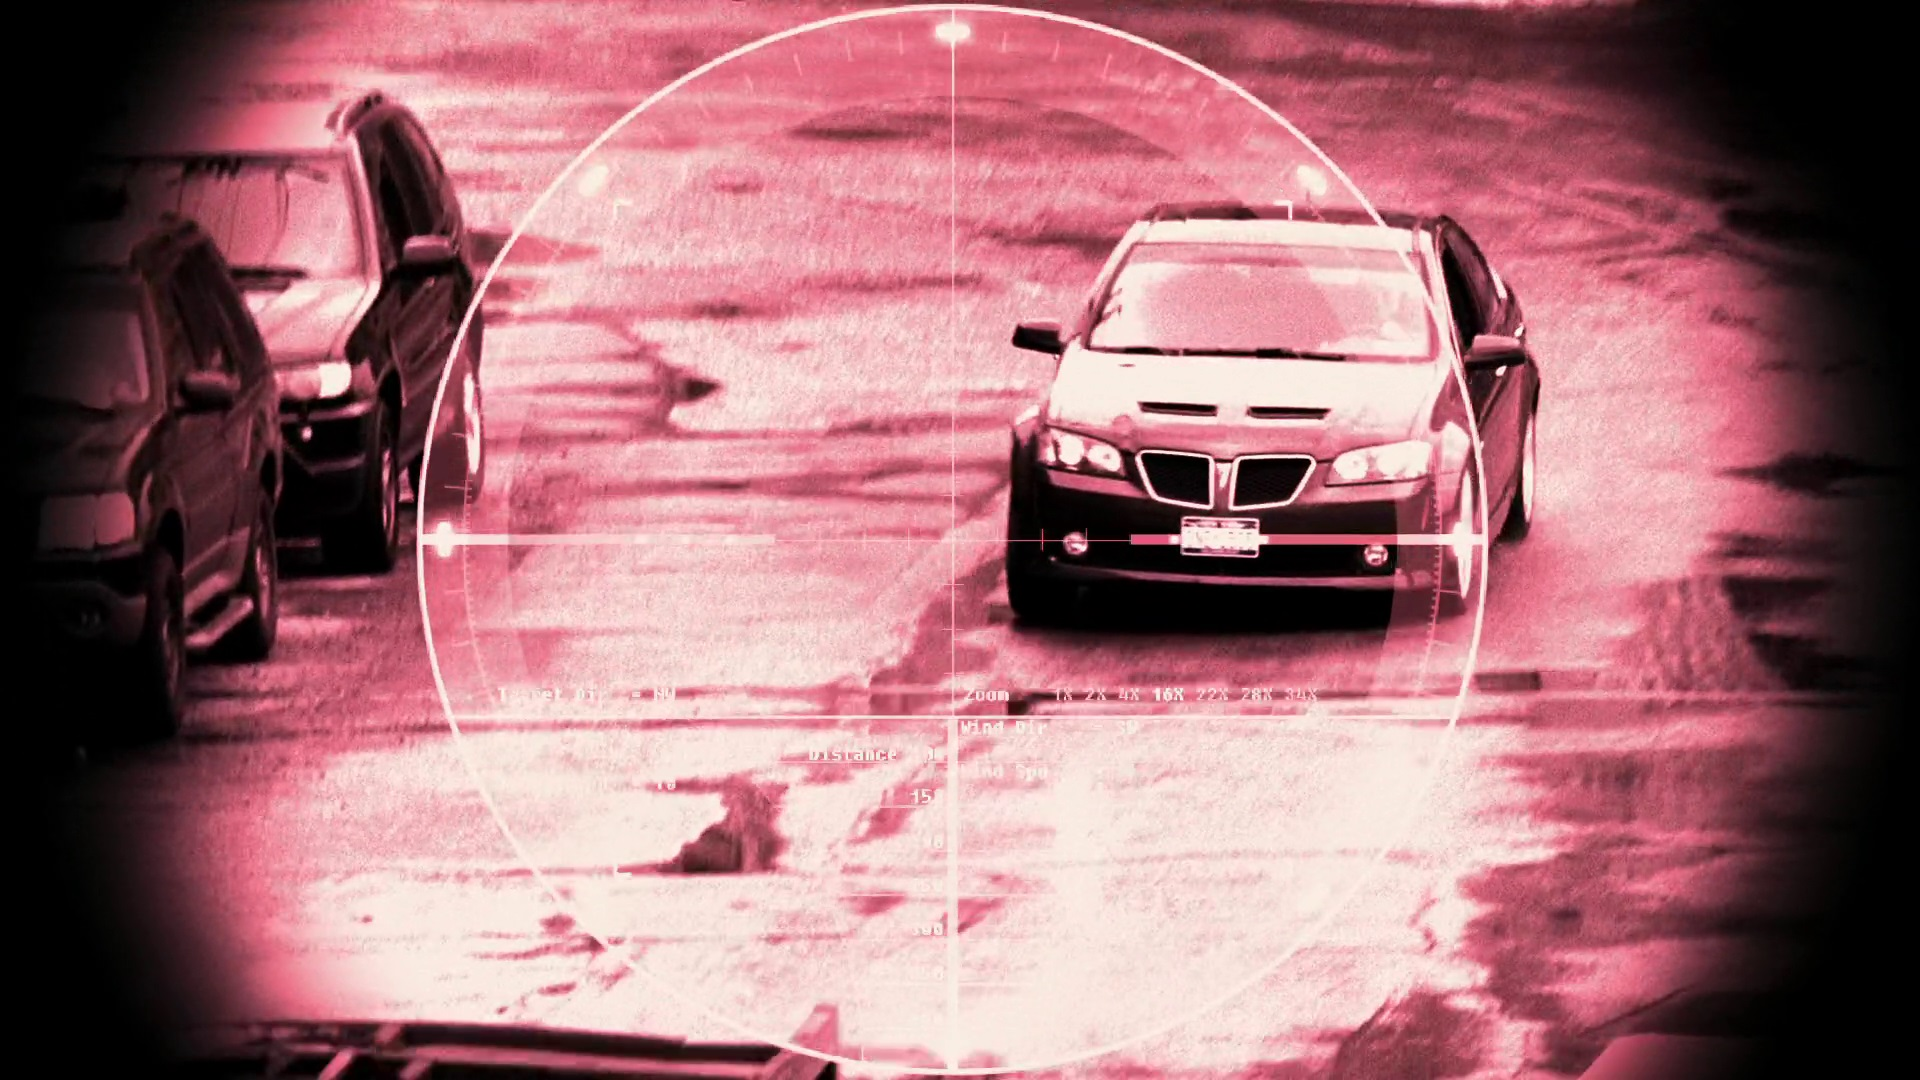 Archivo:8x01 Sniper Crosshairs.jpg